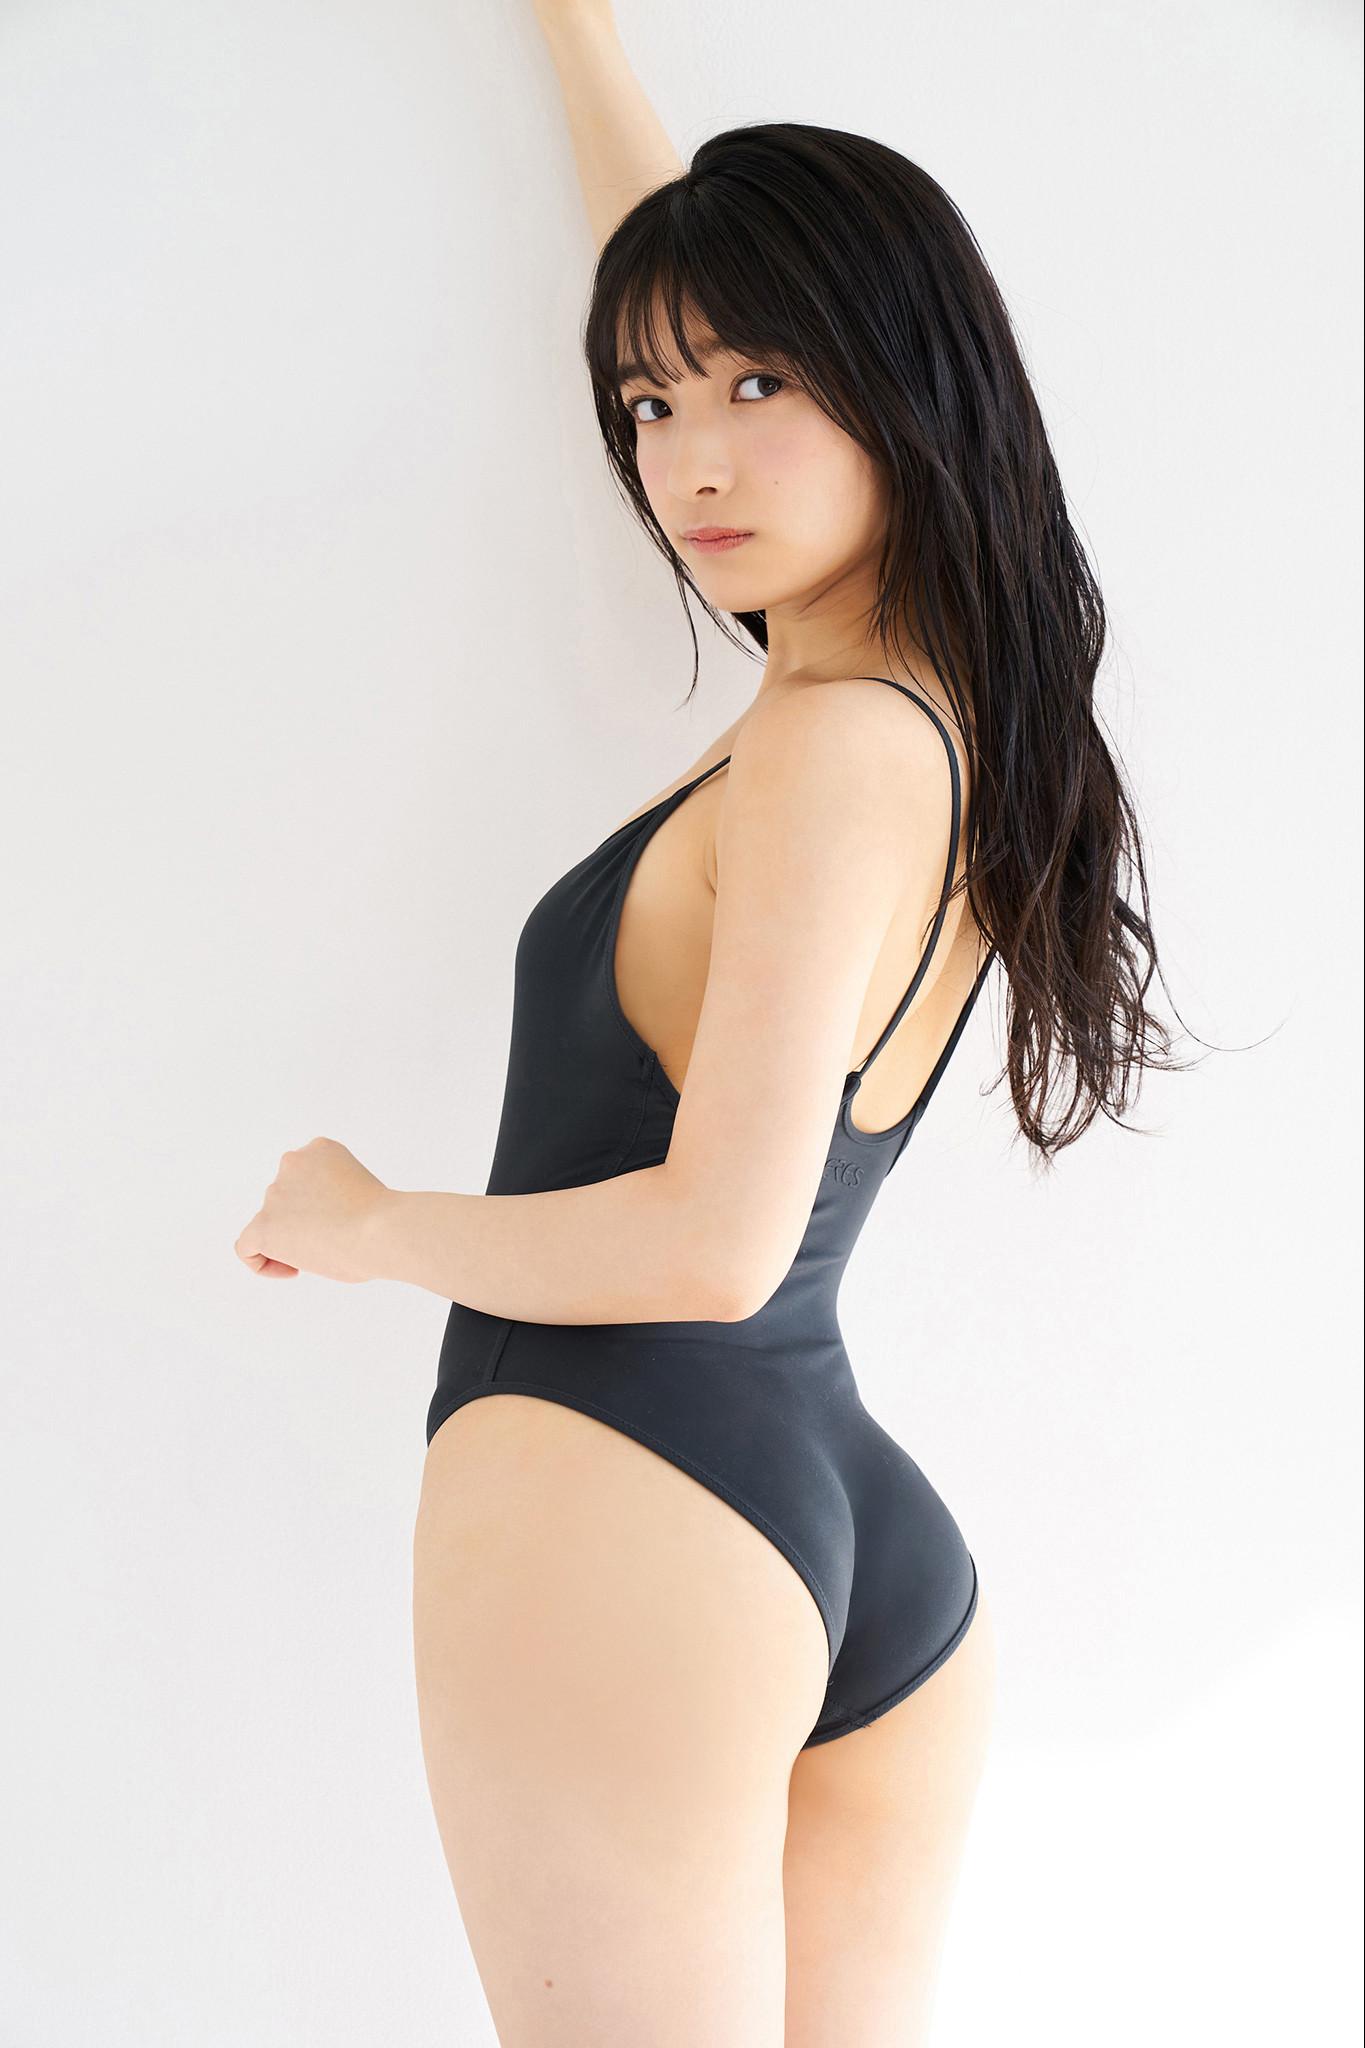 [Yanmaga Web] 蛭田愛梨・ヤンマガアザーっす!33